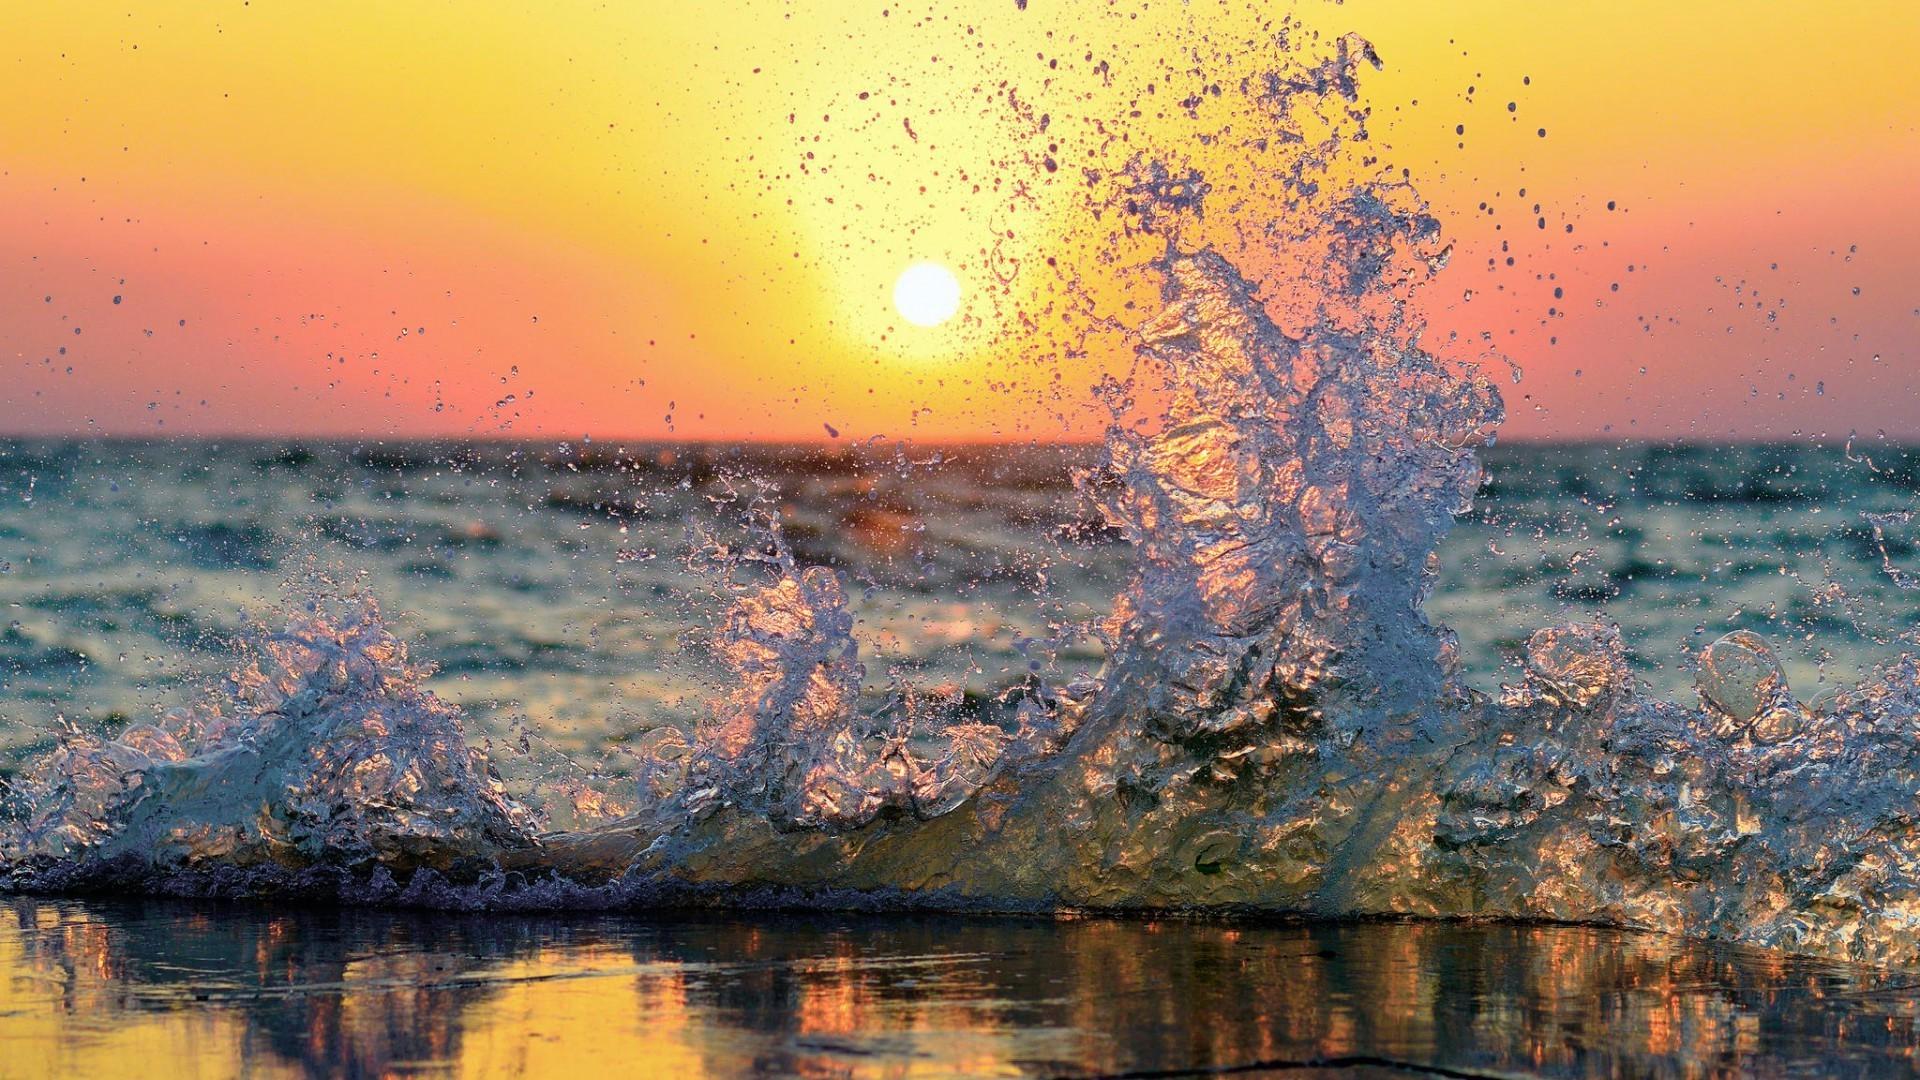 Desktop Wallpaper Vintage Cars Sea Waves Splashes Sun Water Shoreline Wallpapers Hd